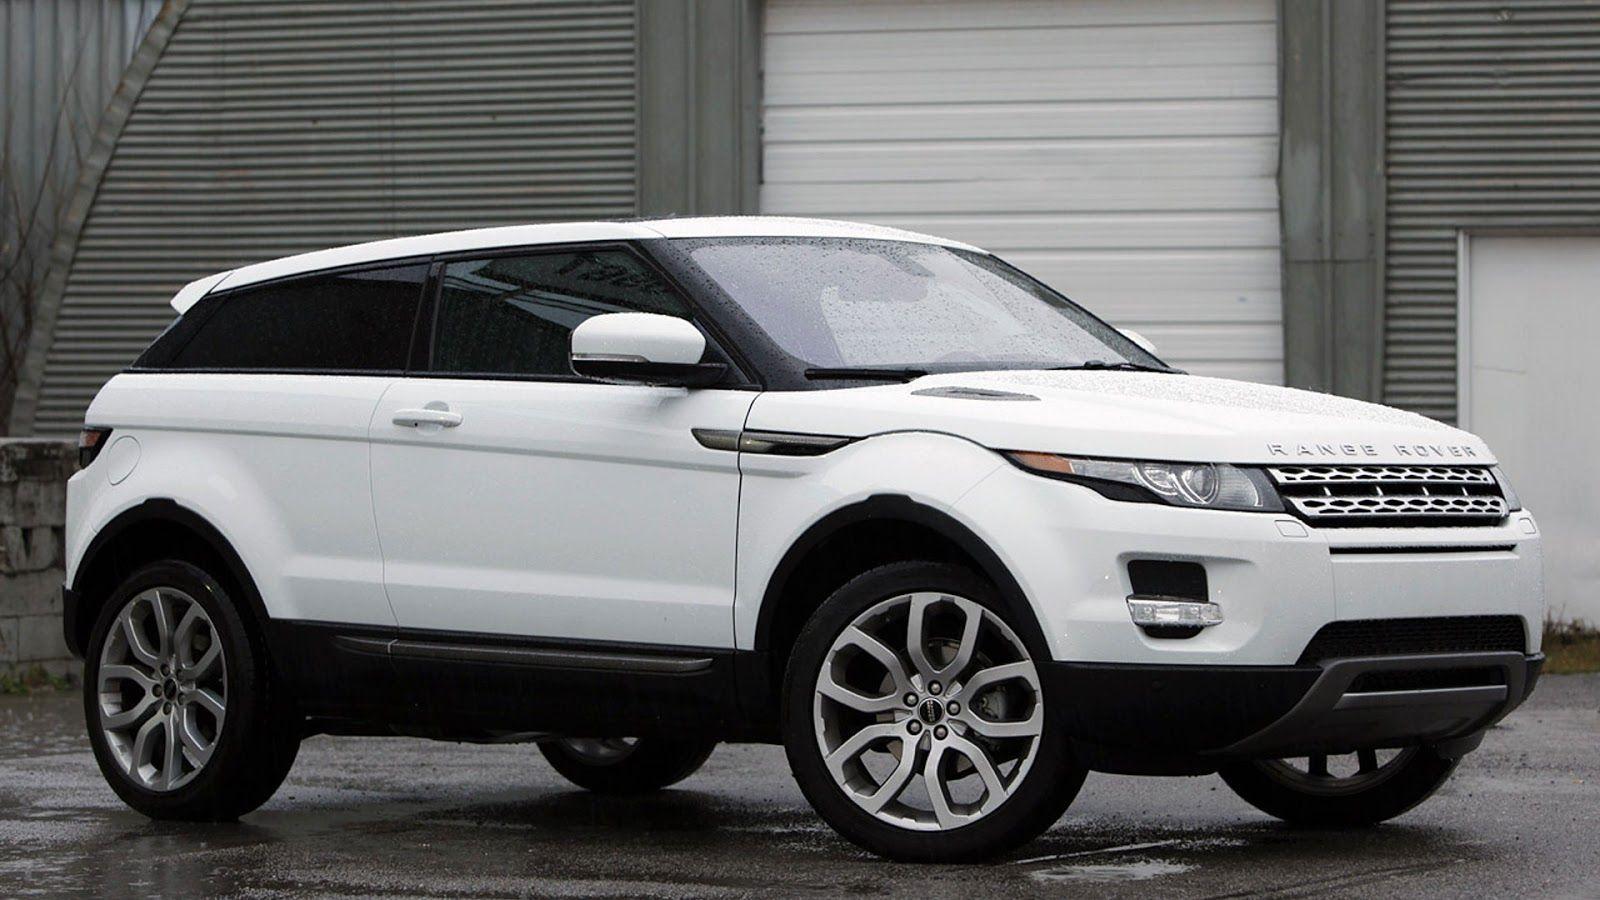 Range Rover Evoque Range Rover Evoque Range Rover Evoque Coupe